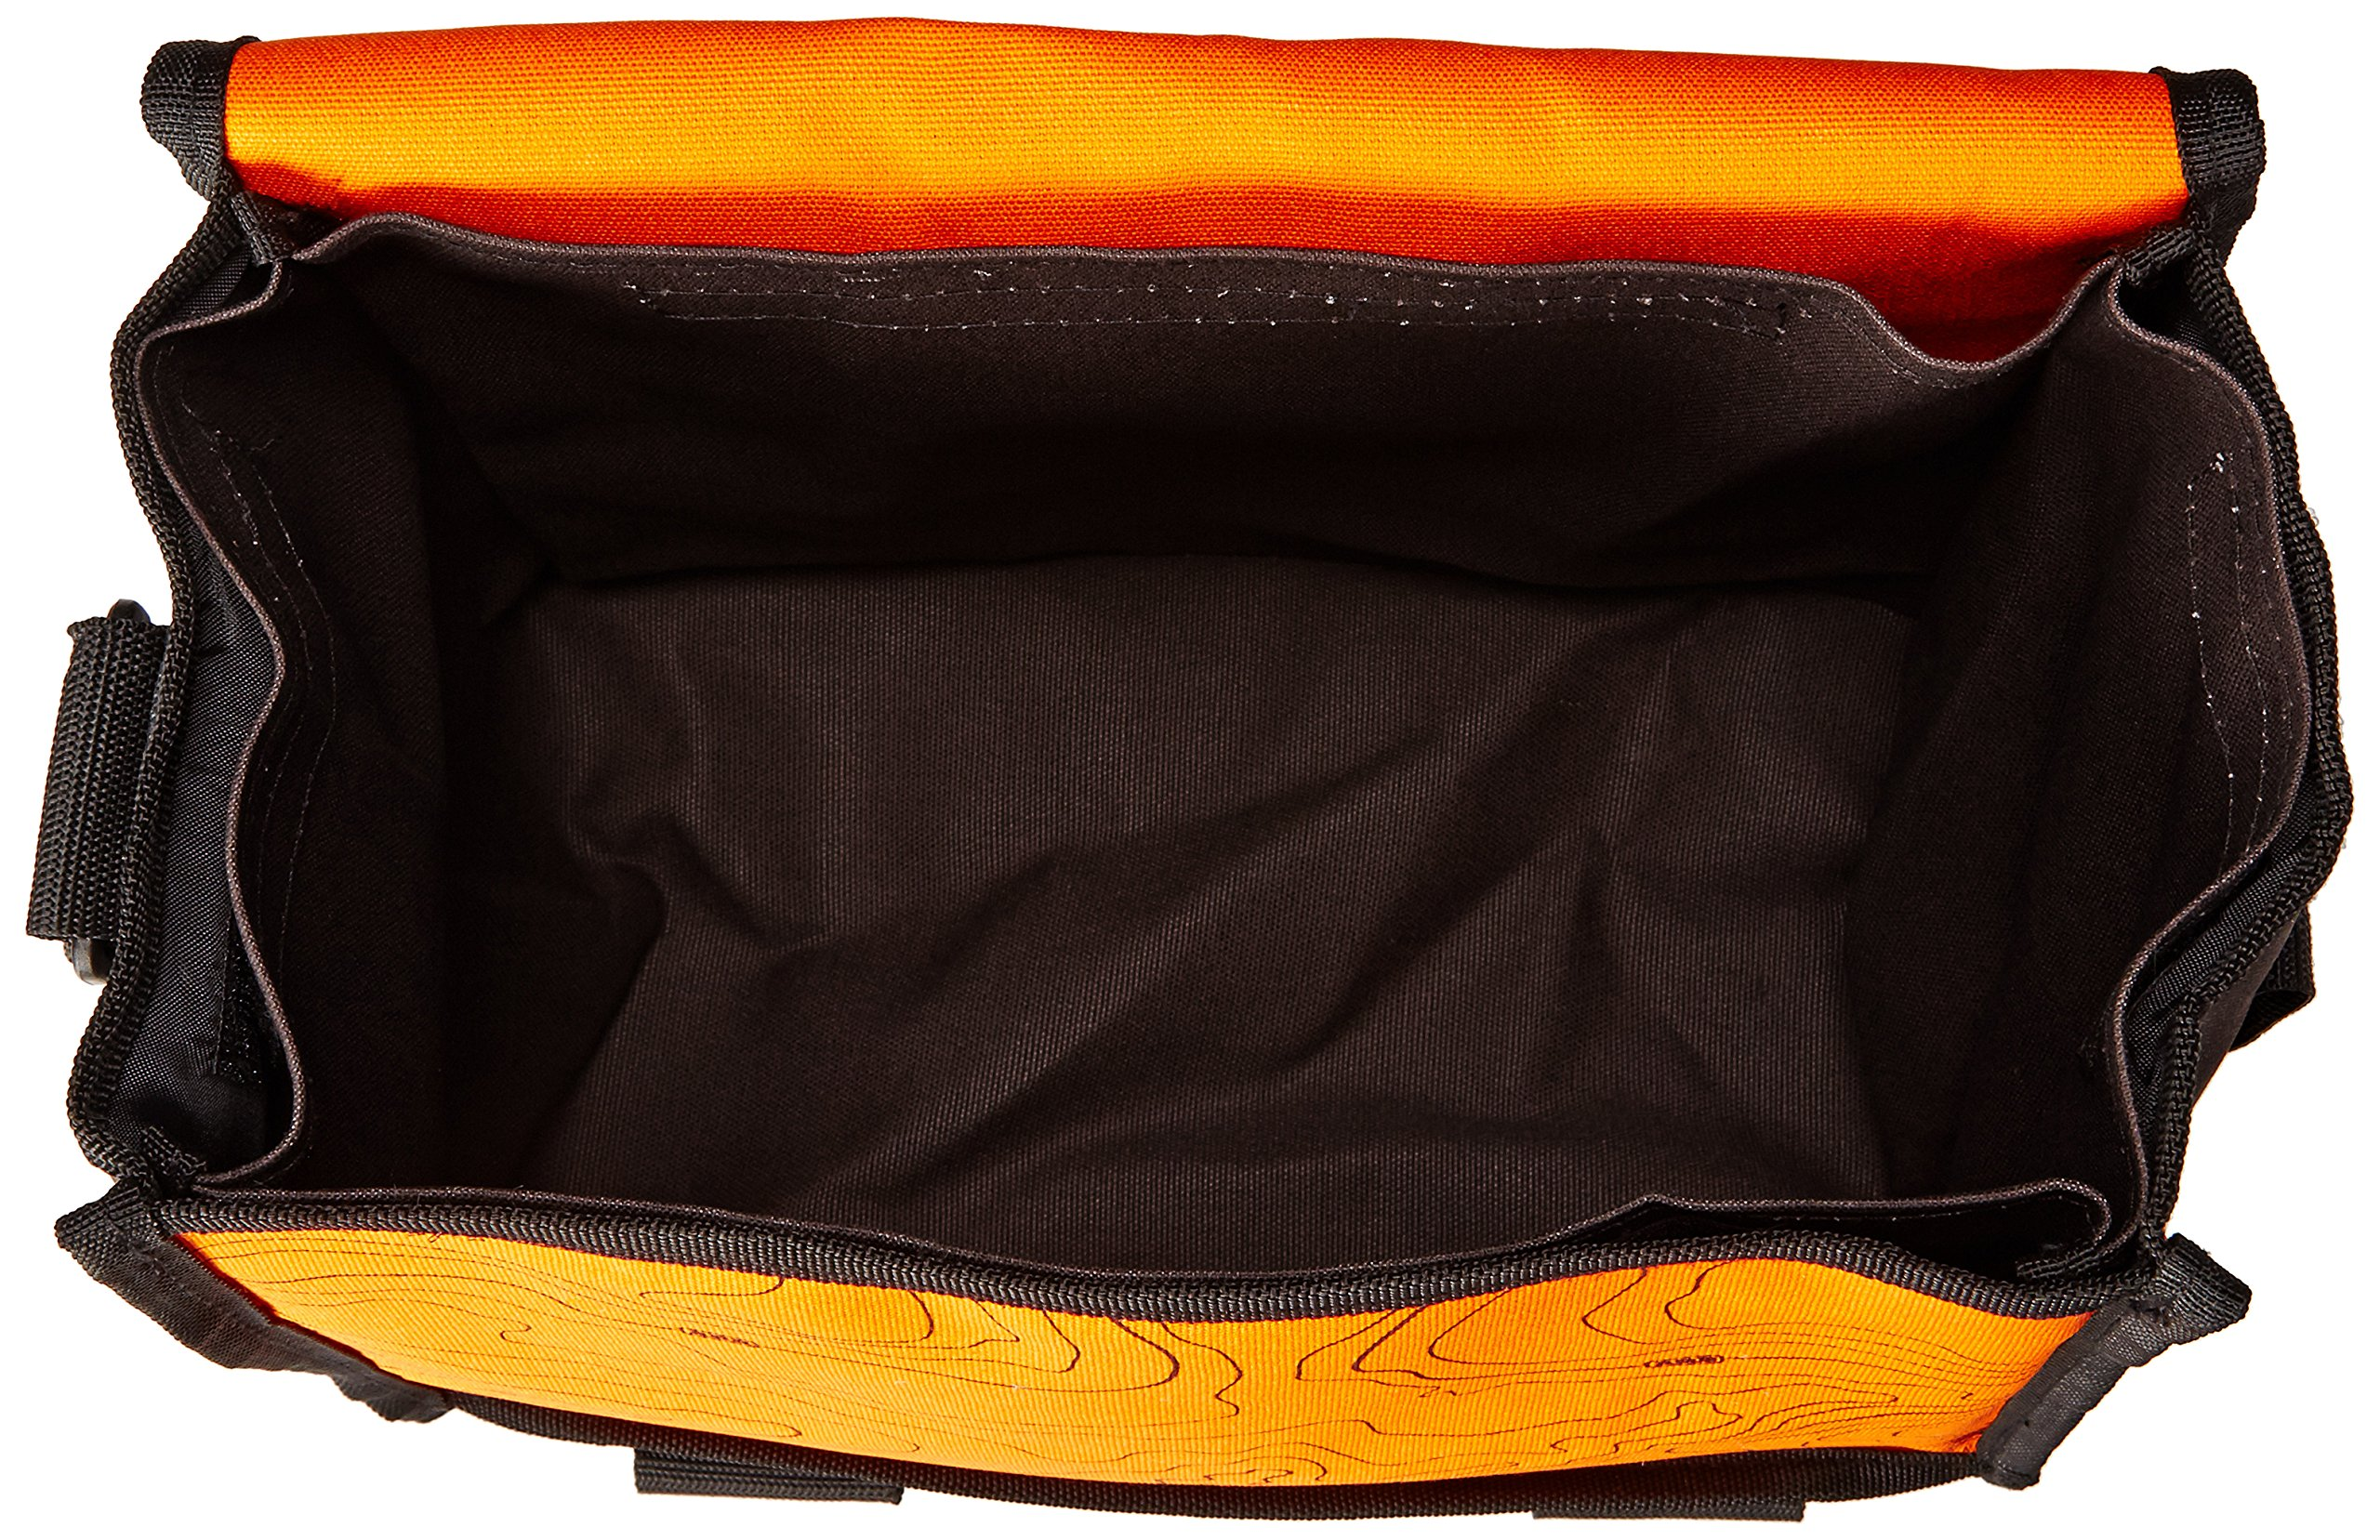 ARB ARB502 Orange Small Recovery Bag by ARB (Image #4)